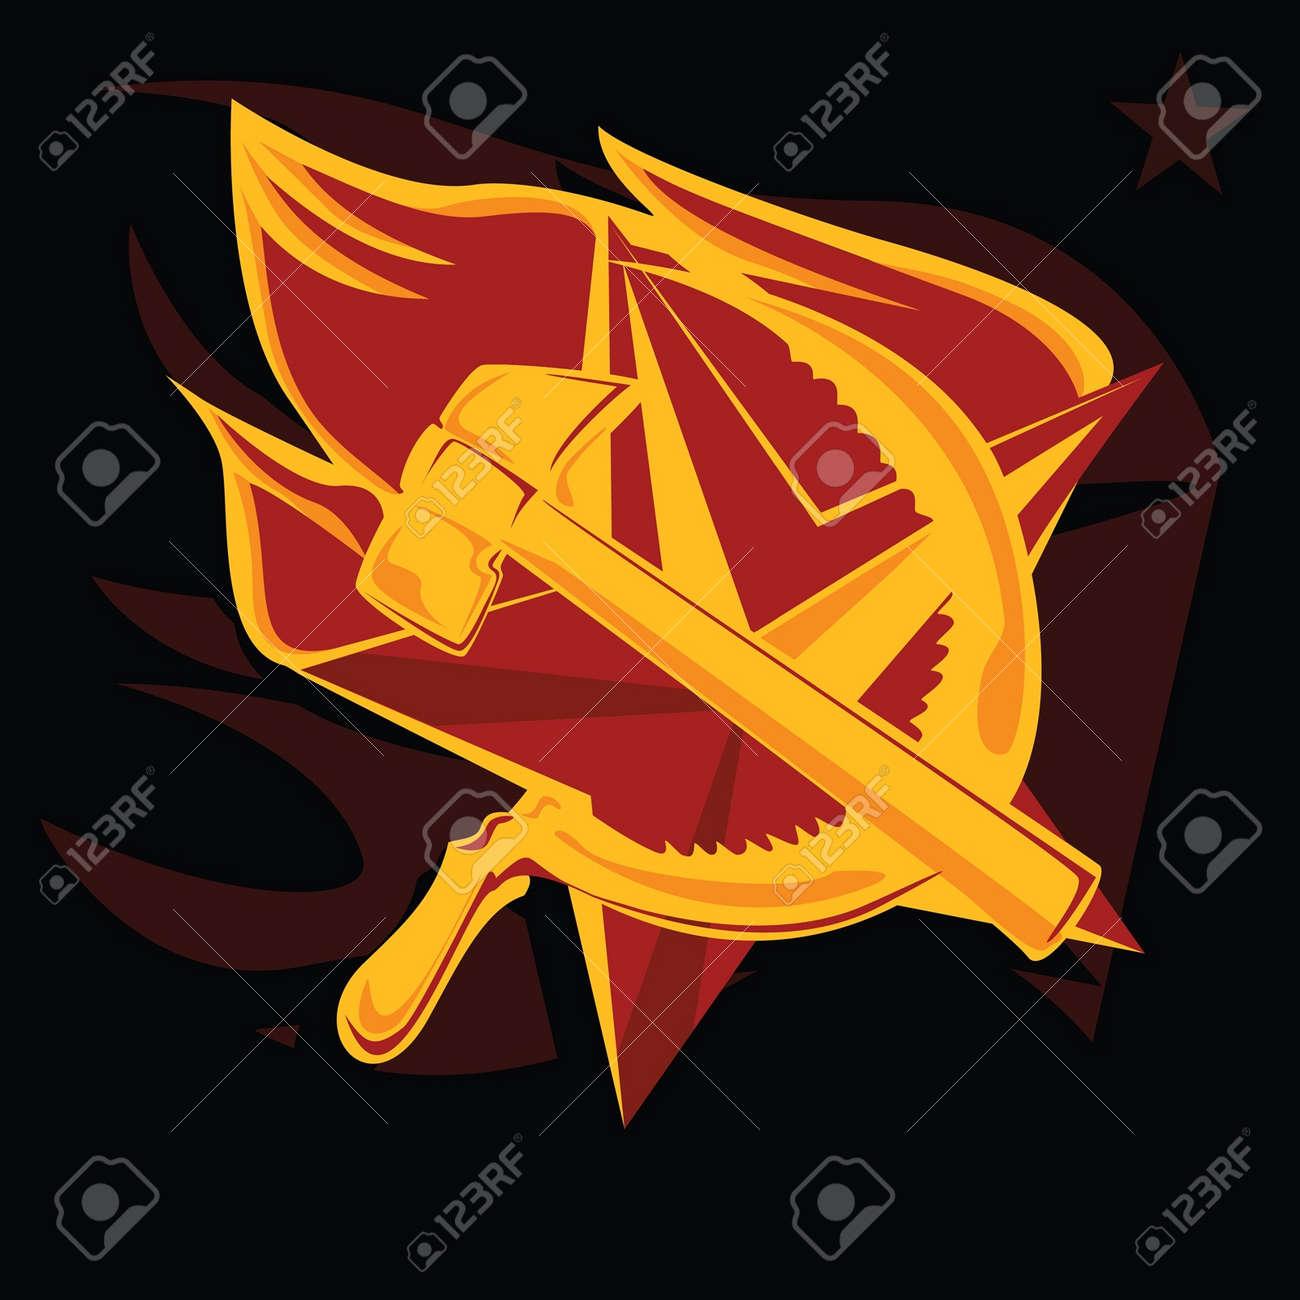 Communist Symbol Star star communism symbol